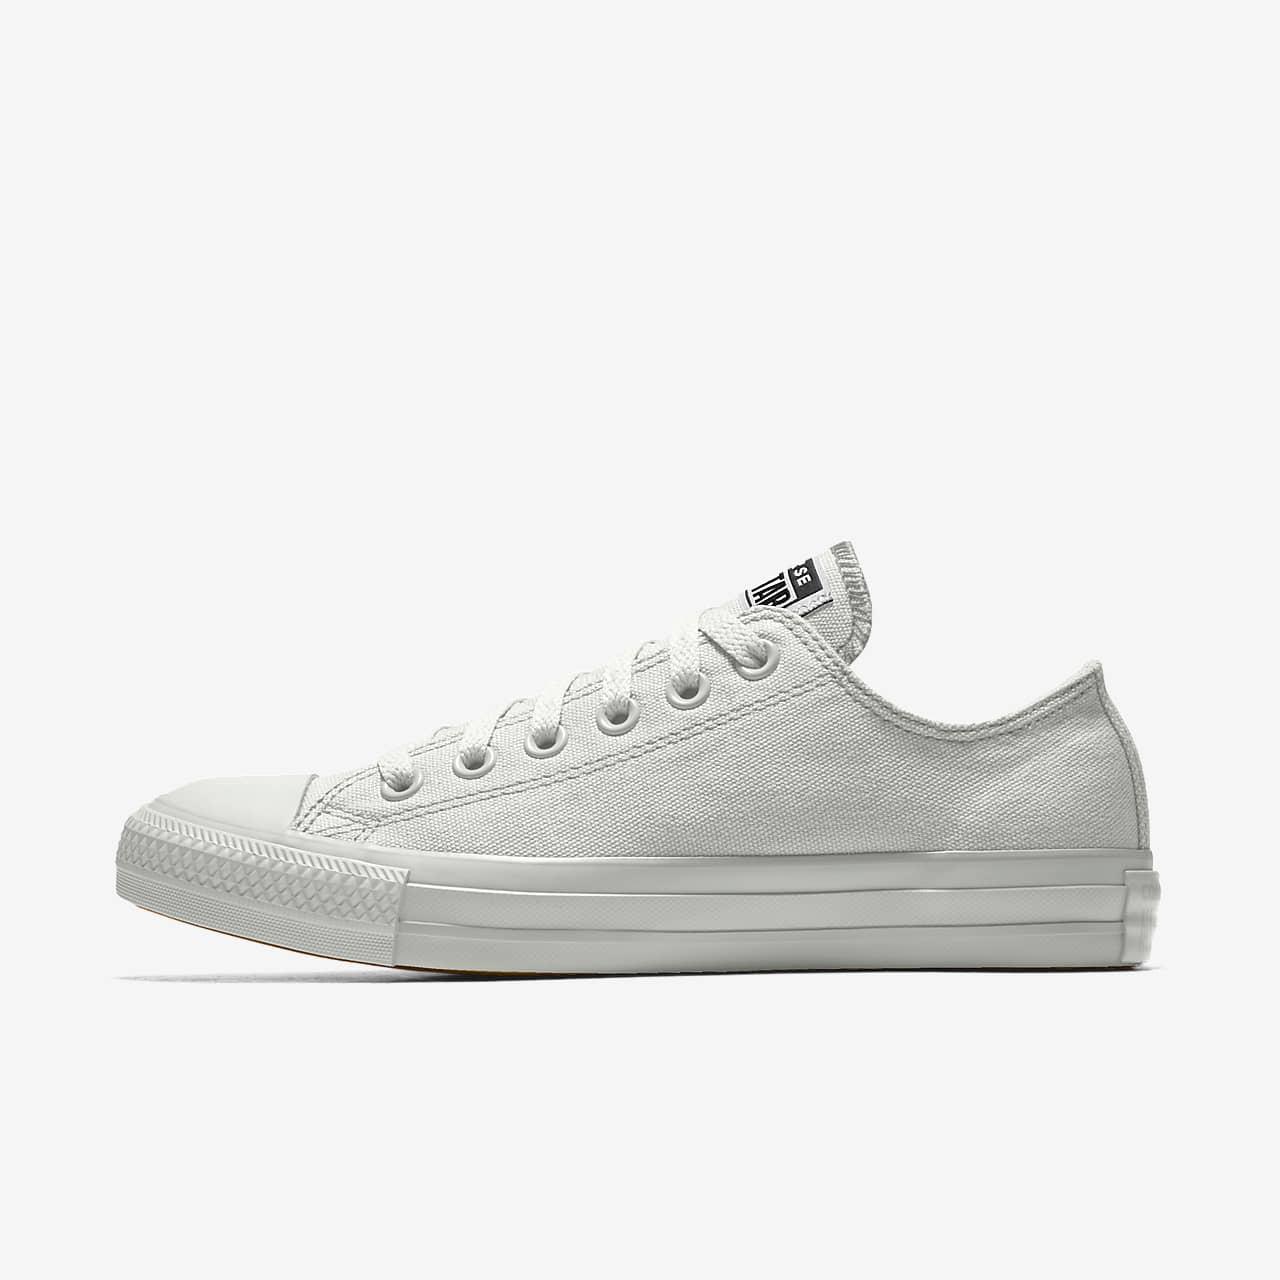 Converse Custom Chuck Taylor All Star Low Top Shoe. Nike.com